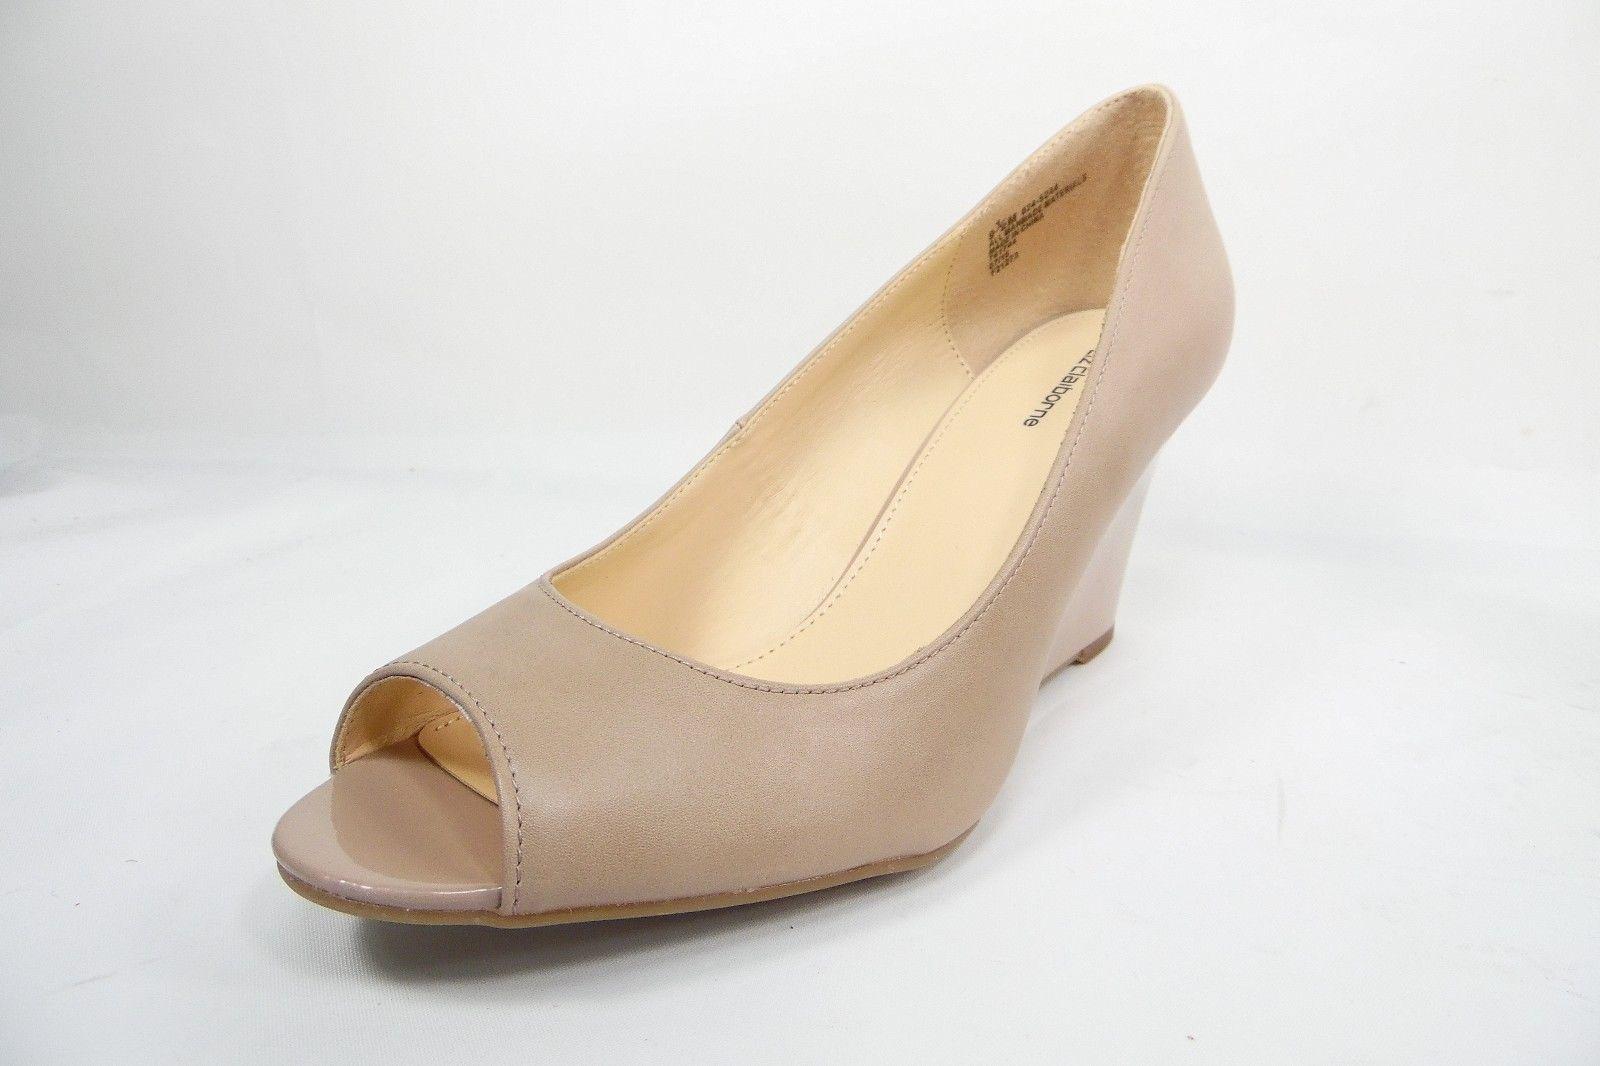 311c200ad71ce Liz Claiborne Paula Womens Shoes Wedge Pumps and 50 similar items. S l1600